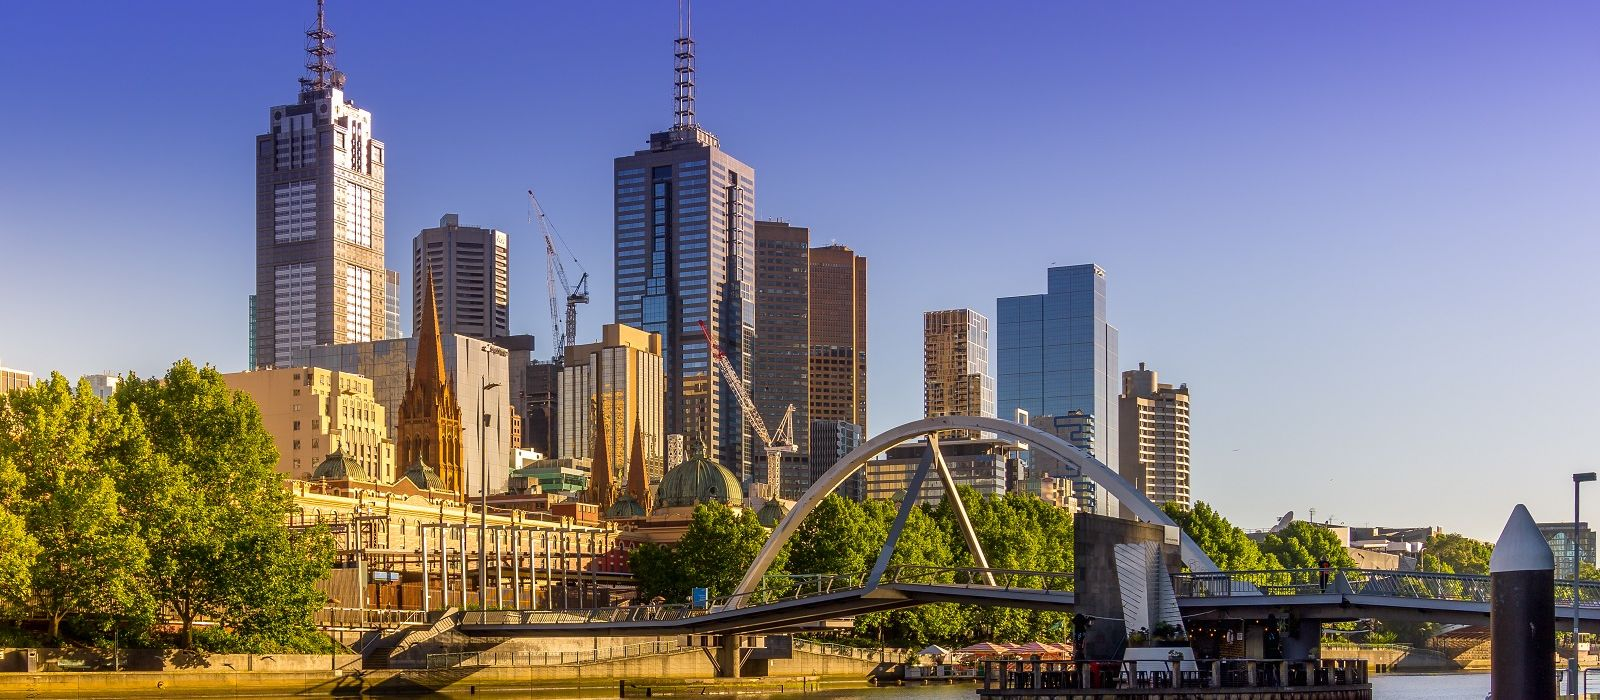 Australien: Großstadtleben & Great Barrier Reef Urlaub 3